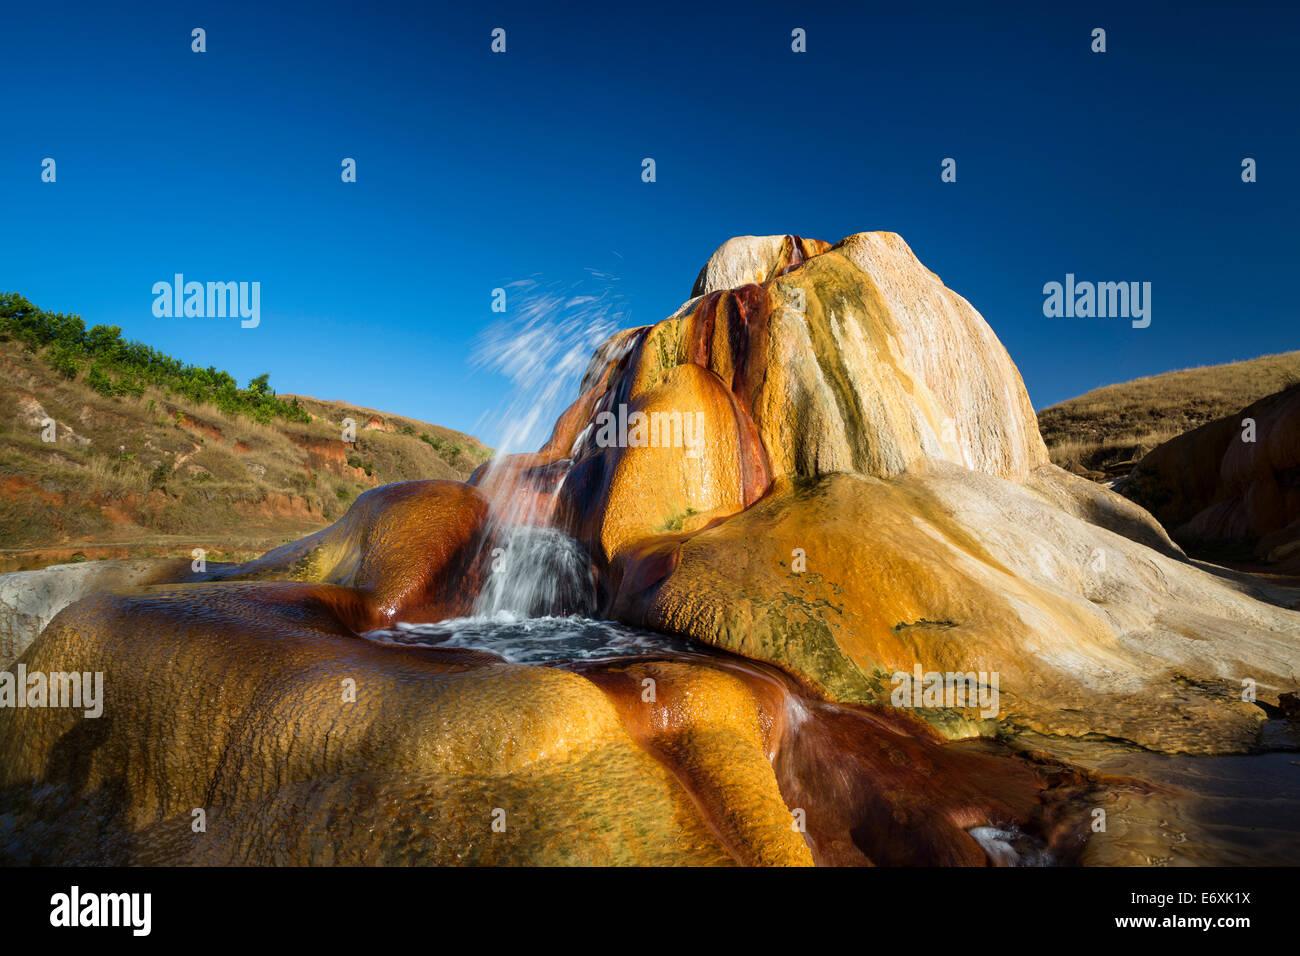 Geyser spouting, Geysers of Ampefy, highlands, Madagascar, Africa - Stock Image